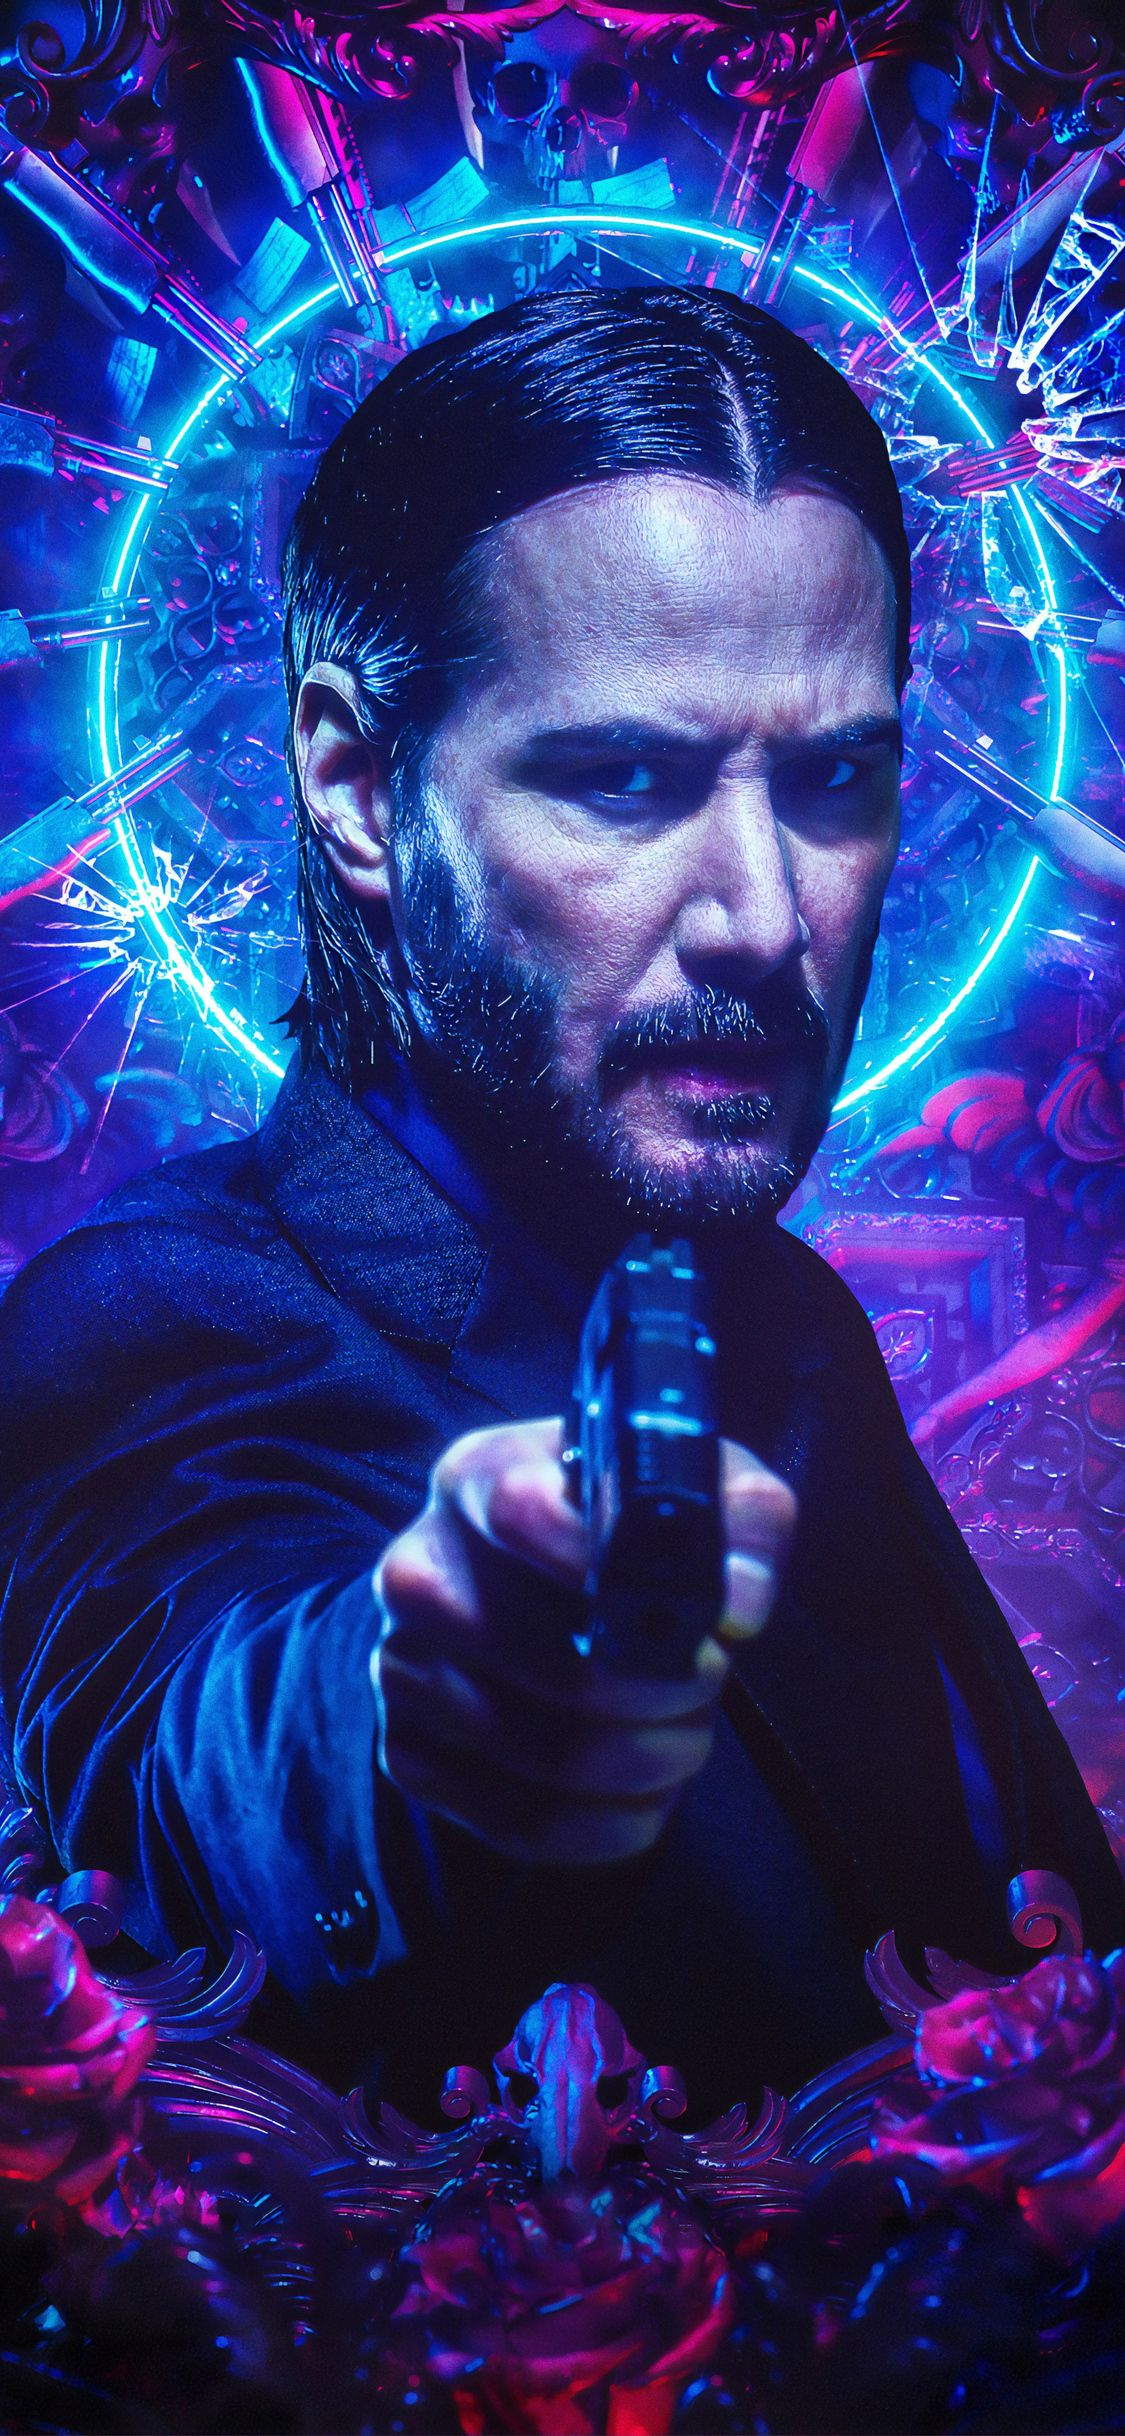 John Wick Chapter 3 Parabellum Wallpaper John Wick Hd John Wick Movie Keanu Reeves